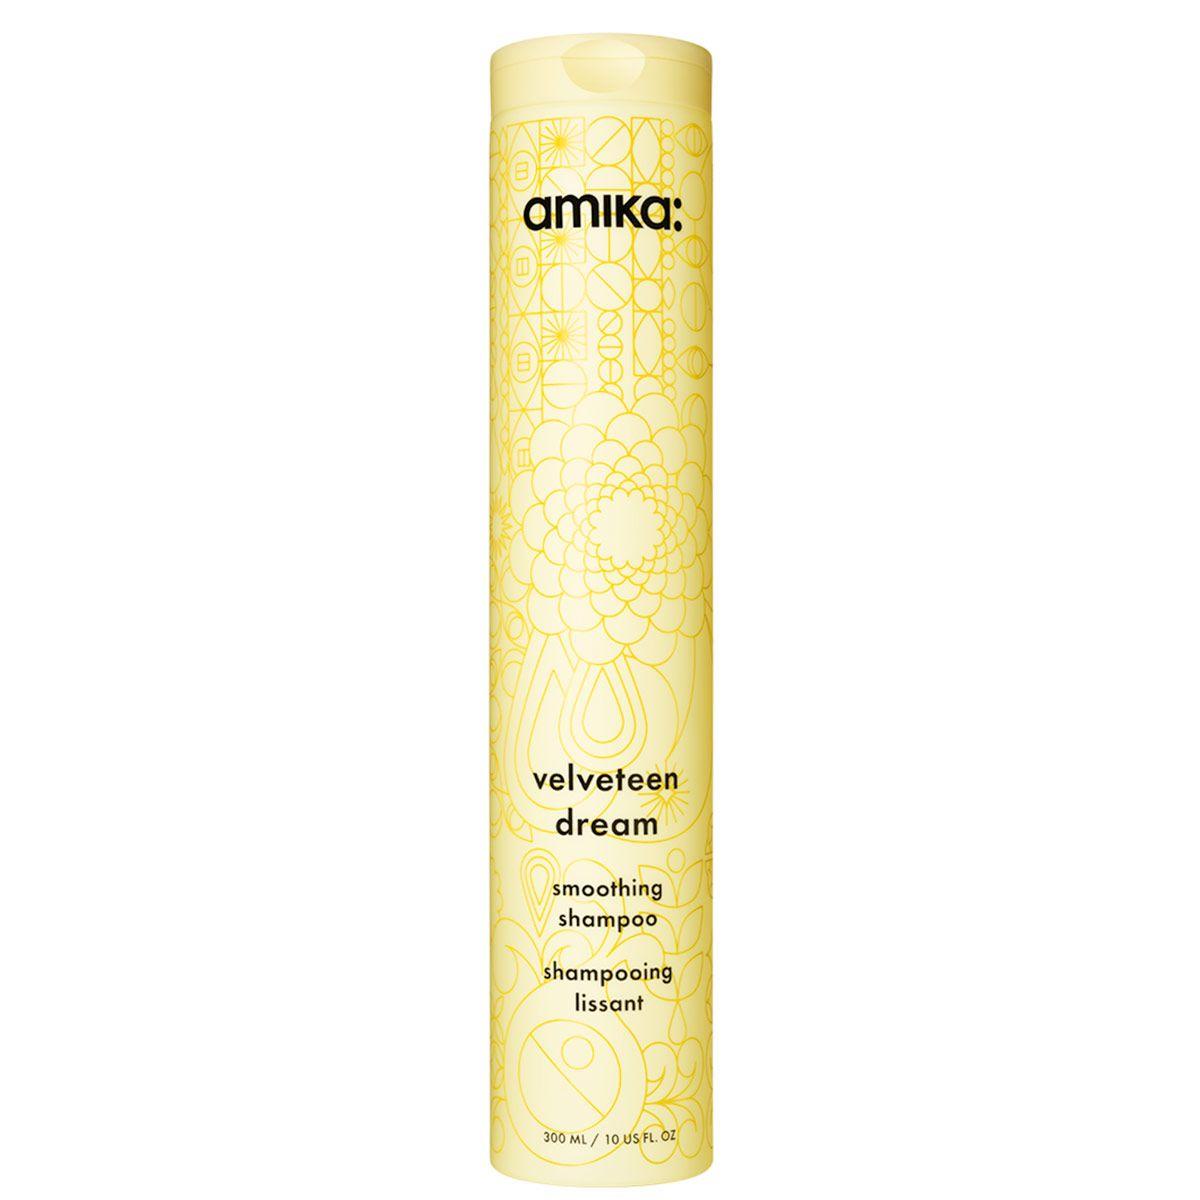 Amika Velveteen Dream Smoothing Shampoo 300ml